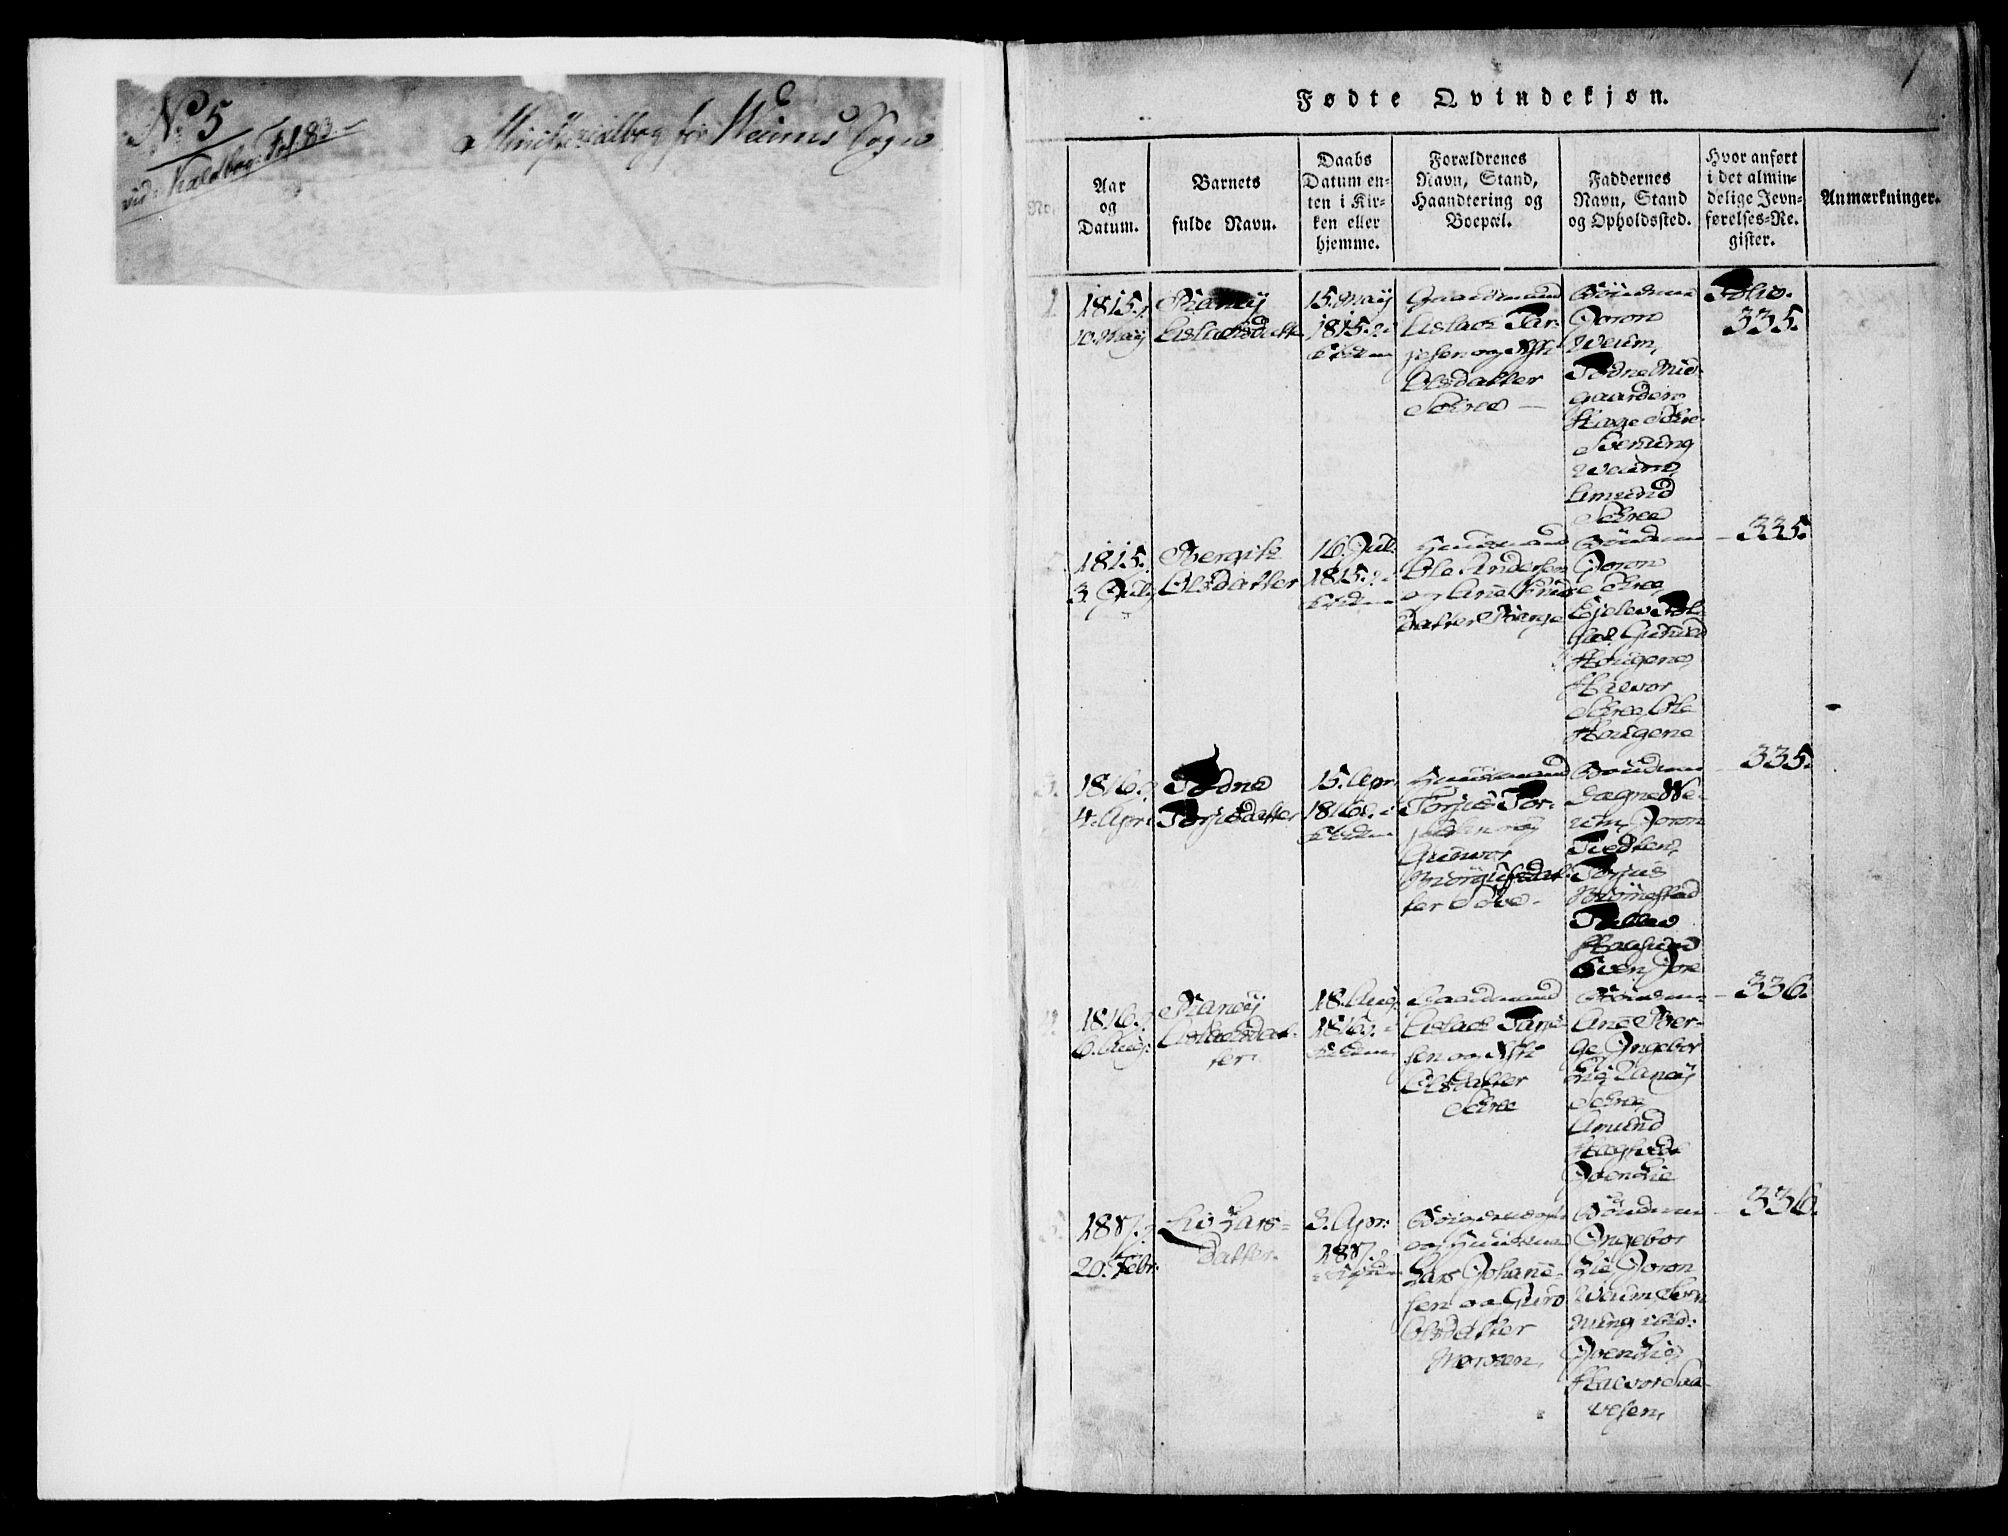 SAKO, Fyresdal kirkebøker, F/Fb/L0001: Ministerialbok nr. II 1, 1815-1854, s. 1